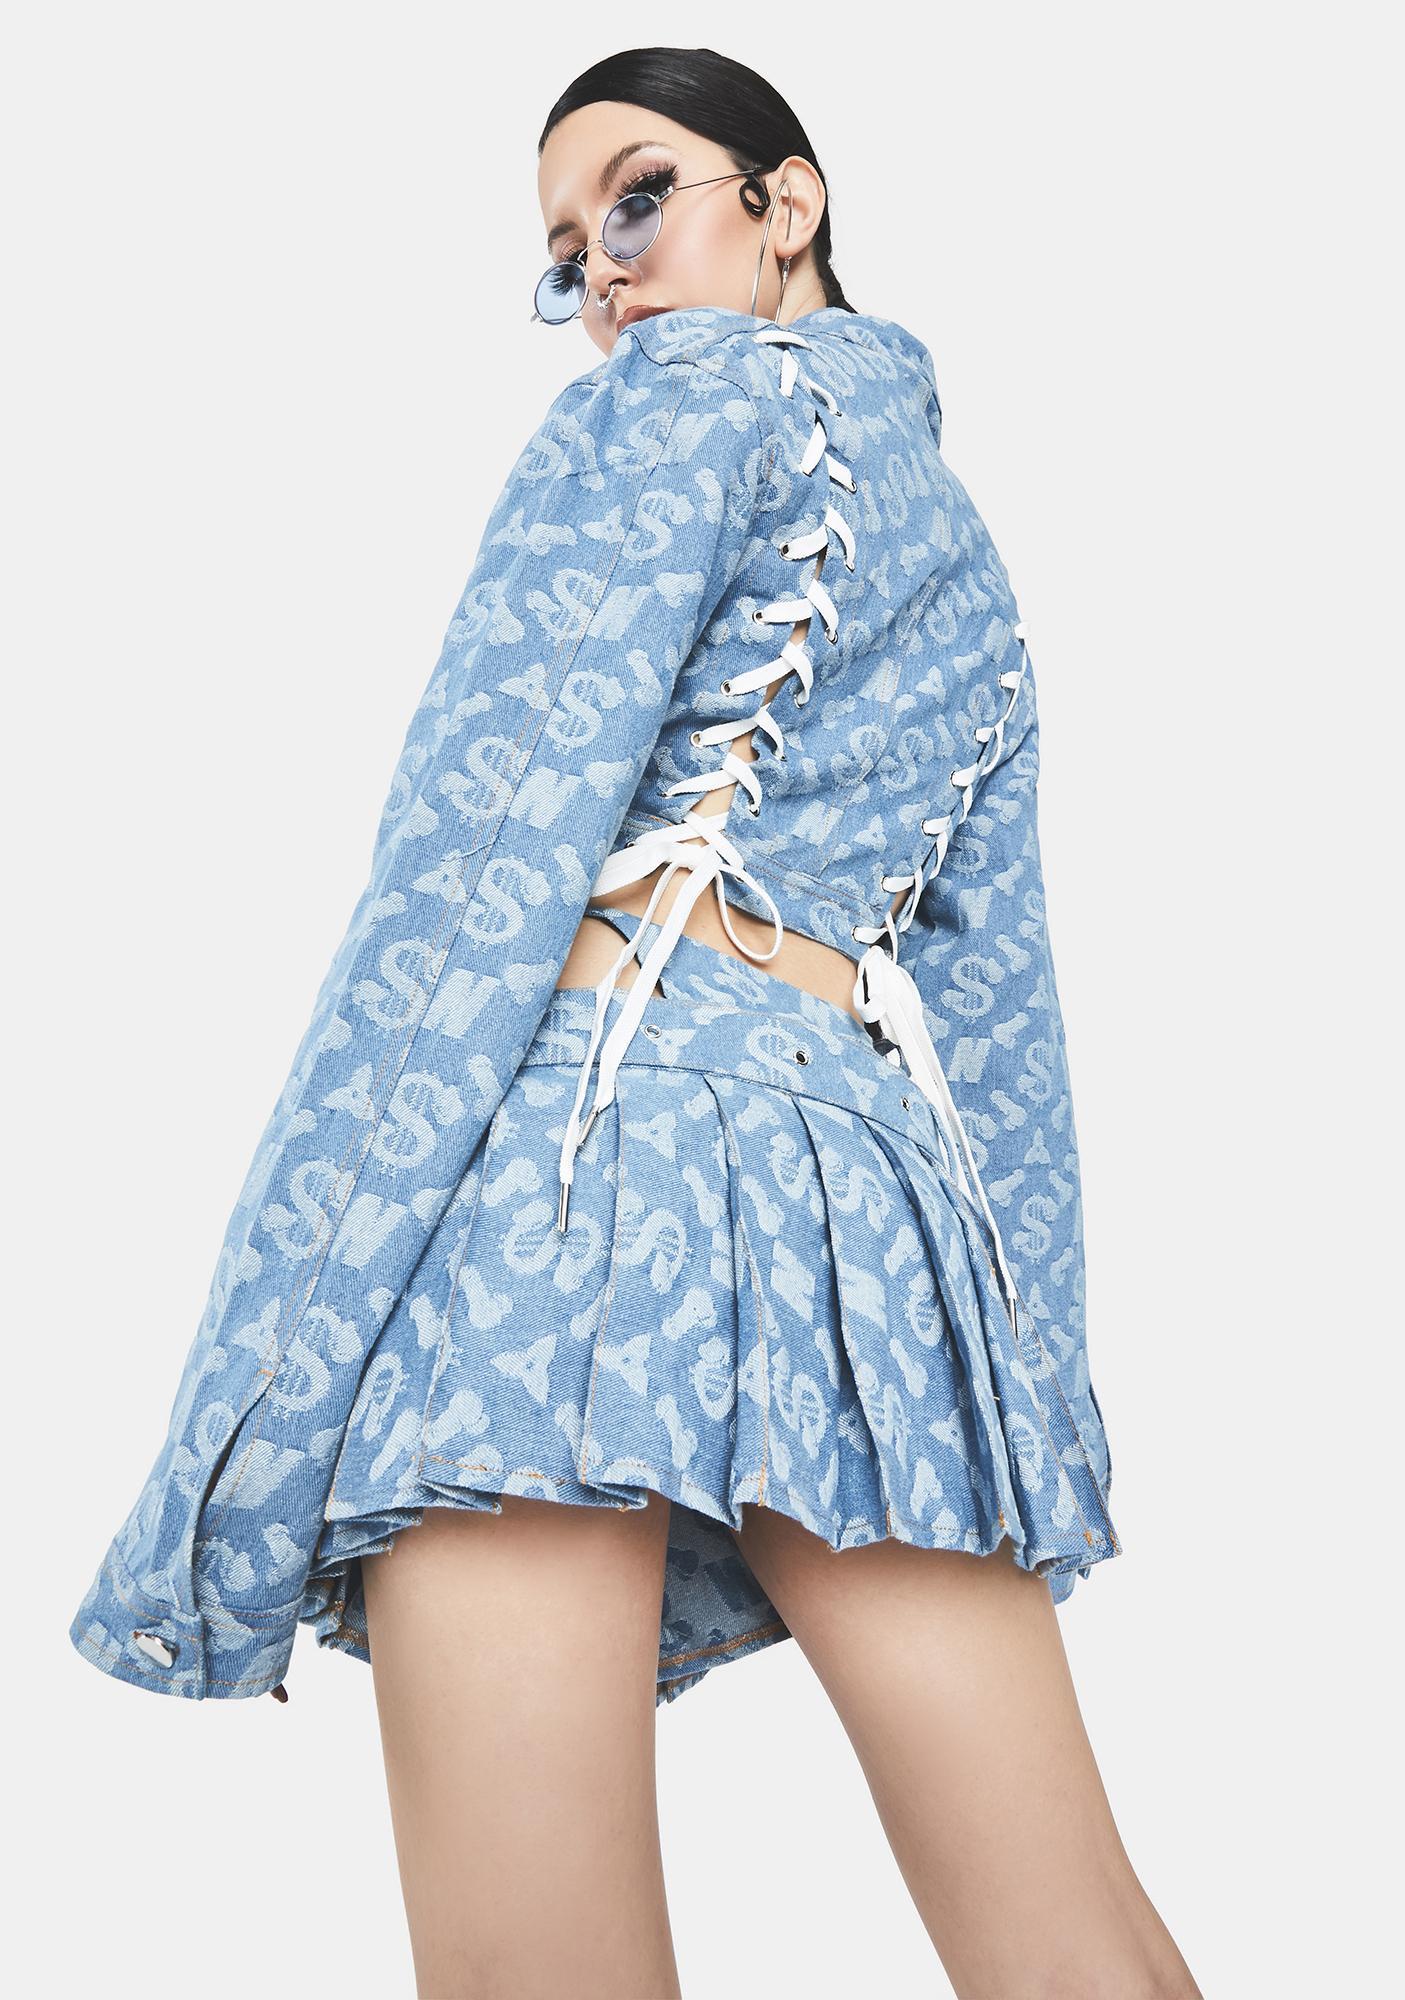 Namilia Dick Monogram Pleated Denim Thong Skirt